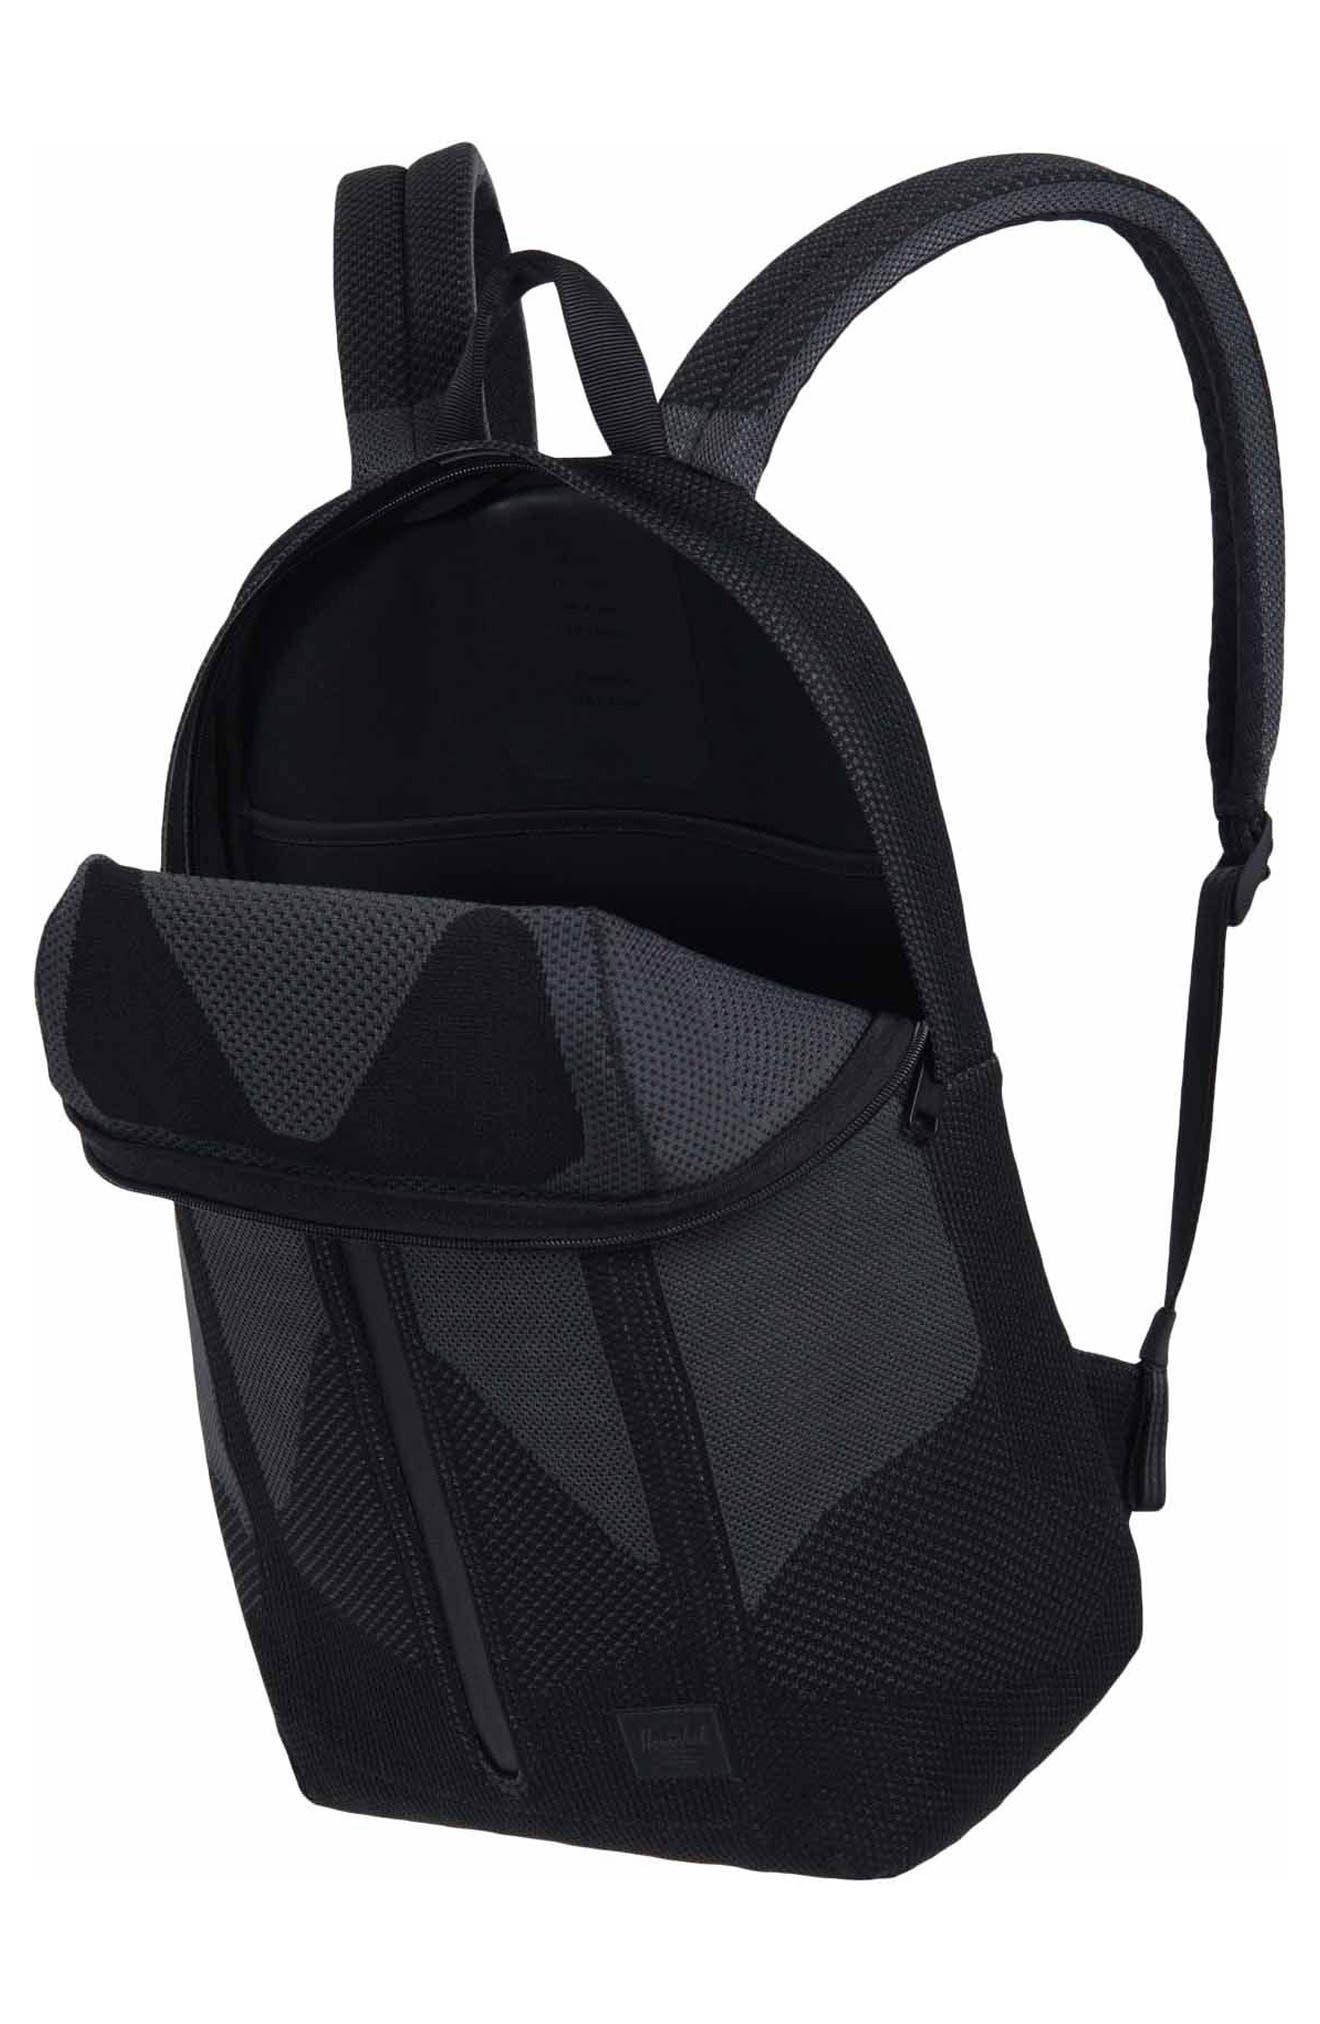 Apex Dayton Backpack,                             Alternate thumbnail 3, color,                             Black Beauty/ Dark Shadow